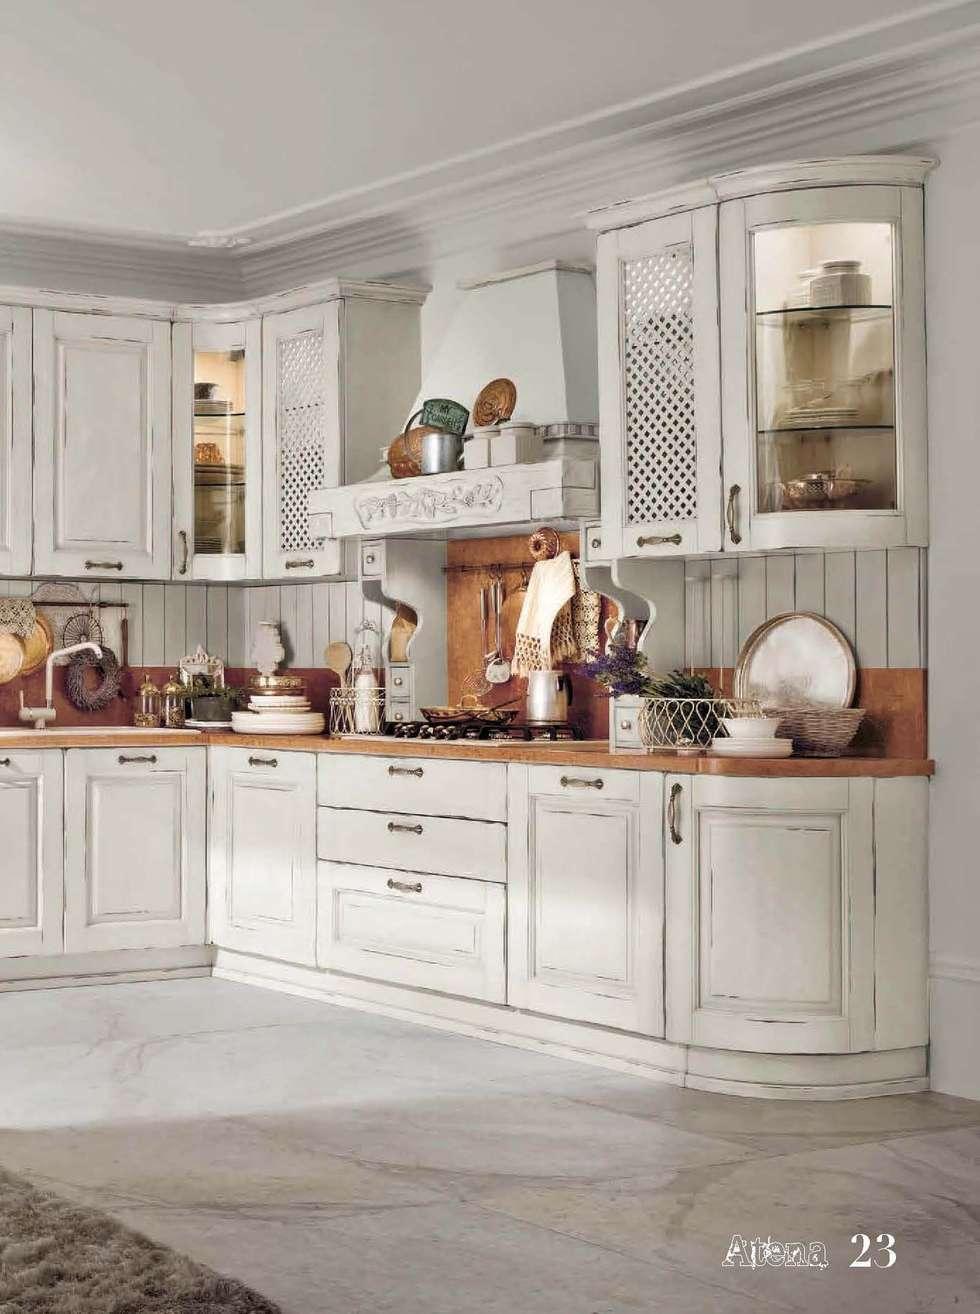 Beautiful Cucina Stile Provenzale Ideas - Home Ideas - tyger.us